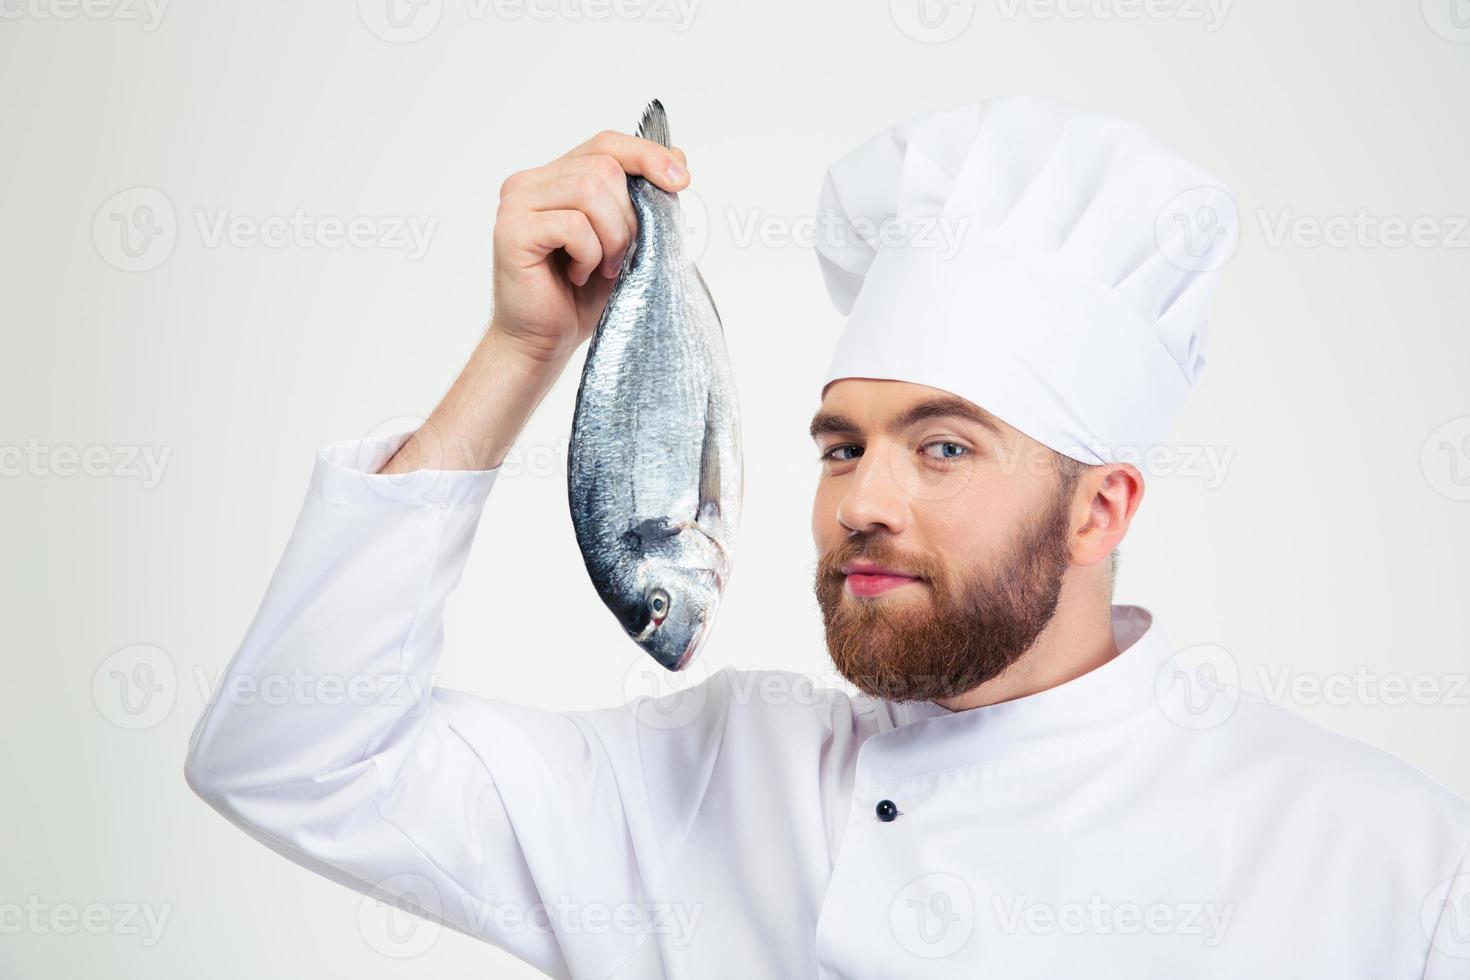 hübscher männlicher Kochkoch, der Fisch hält foto